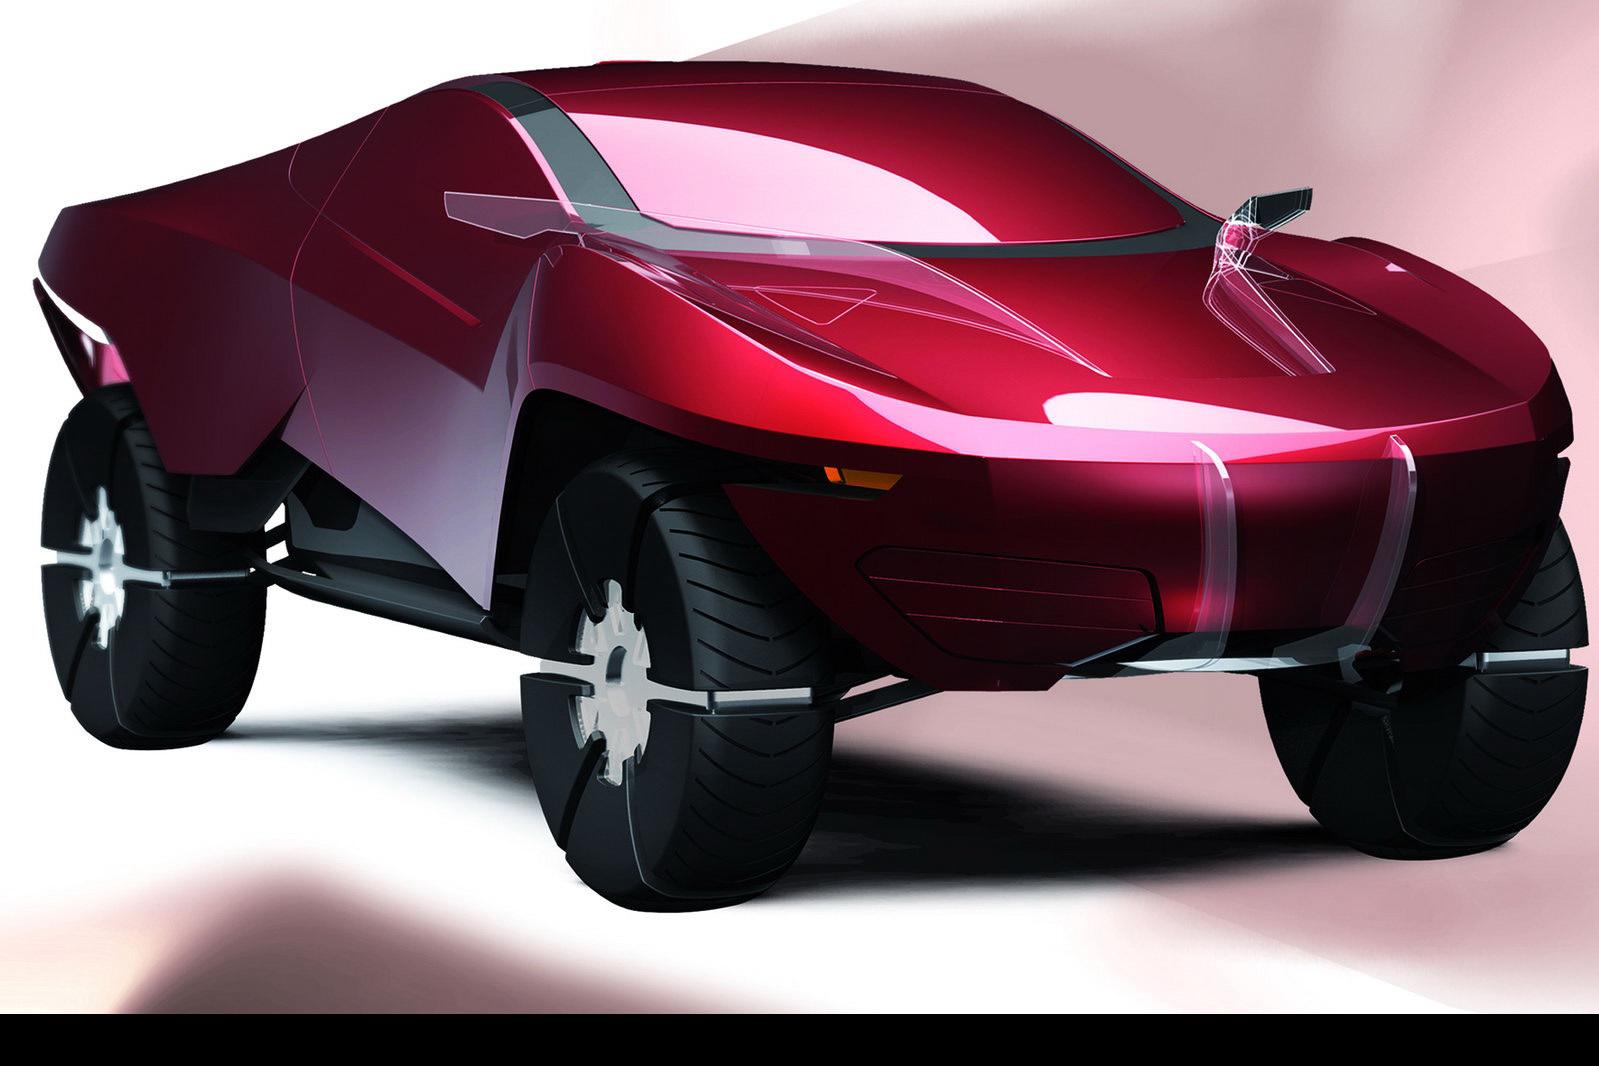 future cars 2020 - HD1599×1066